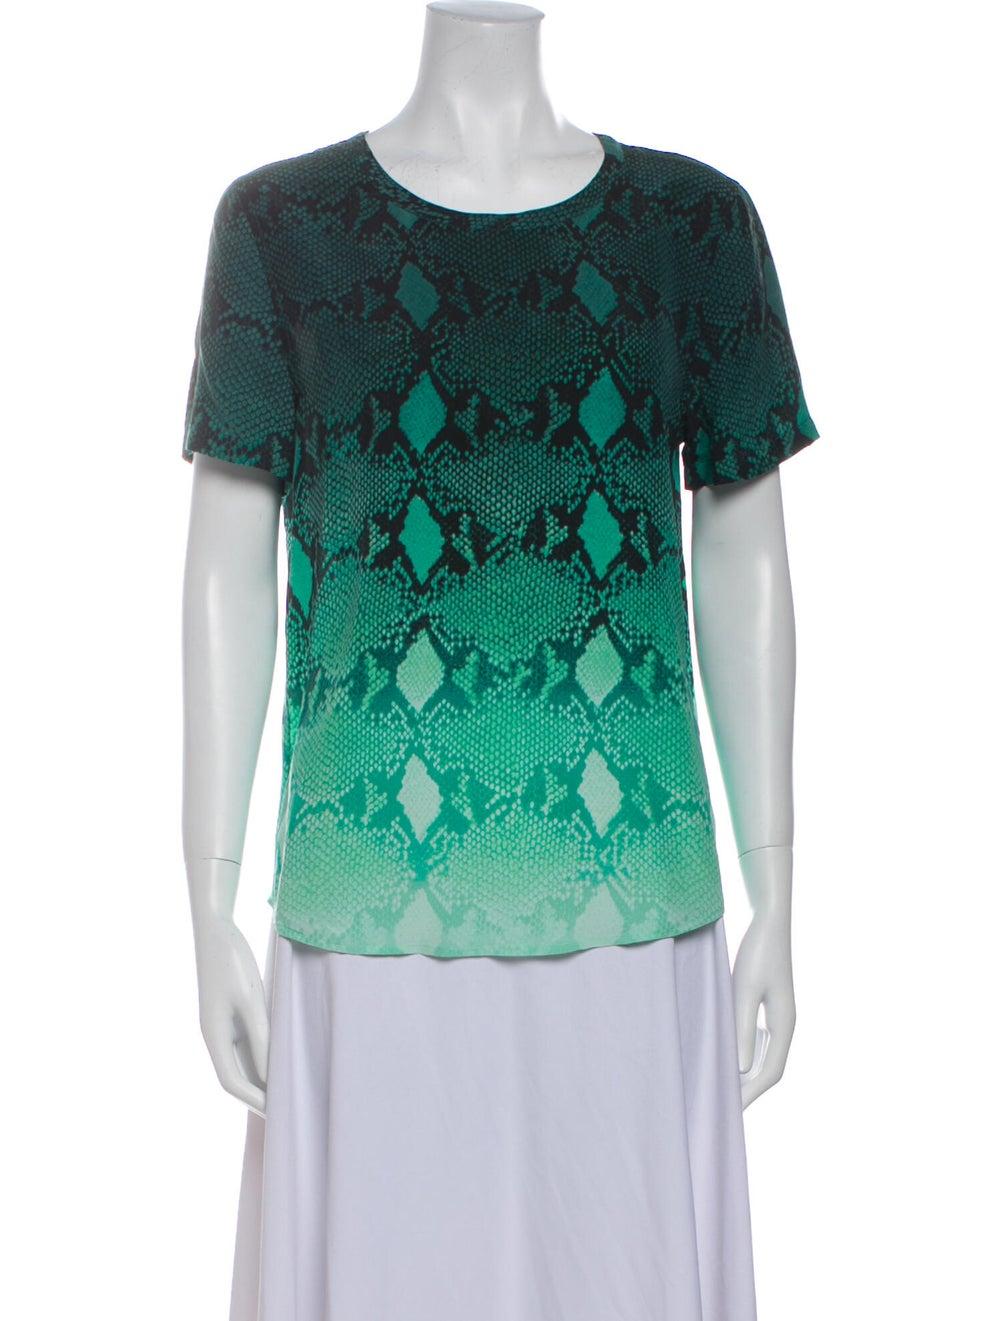 Equipment Silk Animal Print T-Shirt Green - image 1